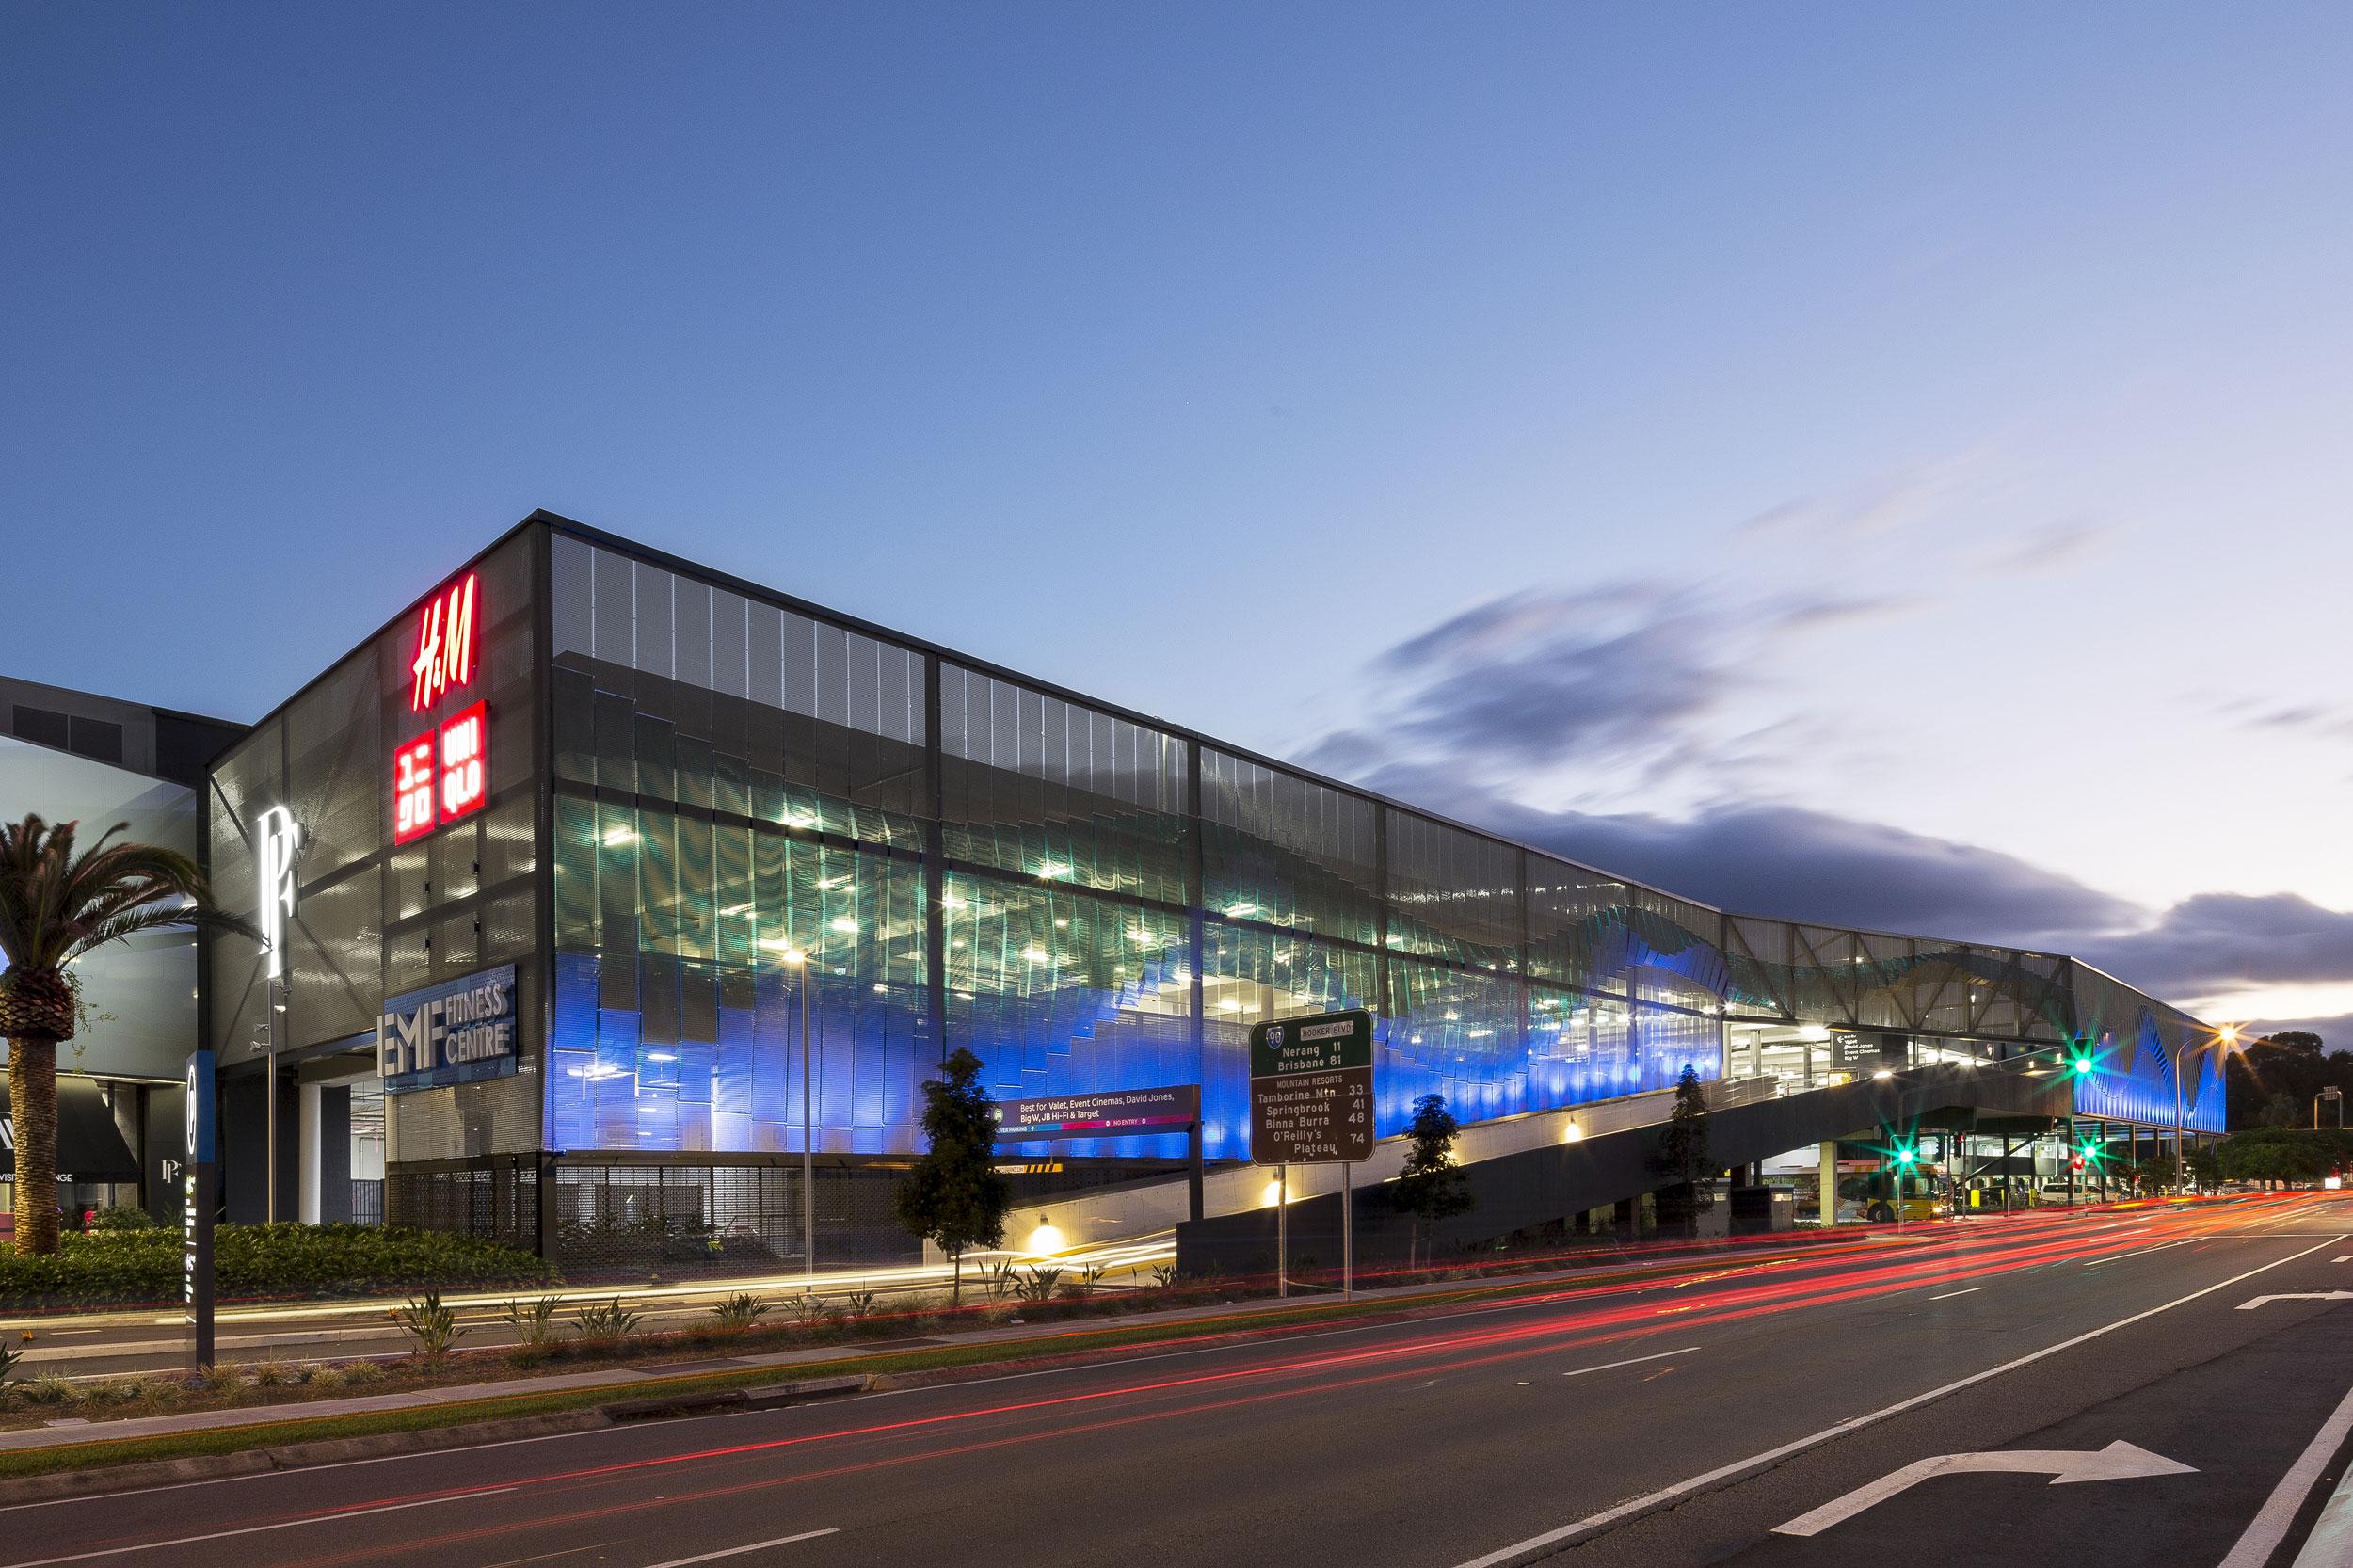 Kaynemaile Armour Carpark Facade for Pacific Fair Shopping Center, Gold Coast, Australia